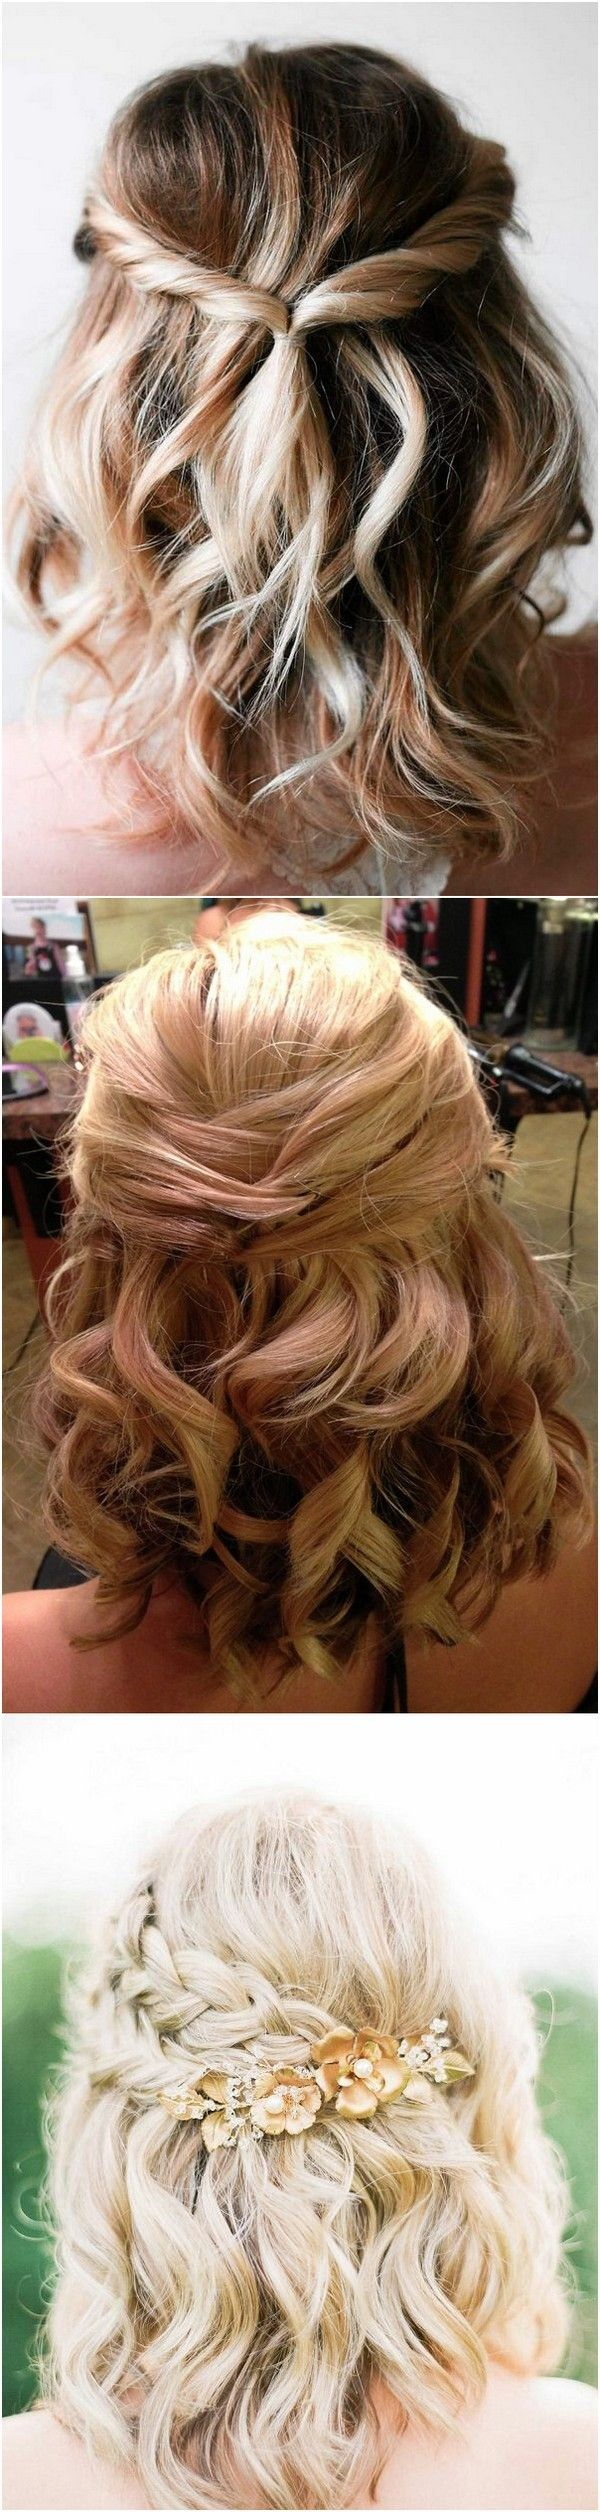 Half Up Half Down Easy Bridal Hairstyles For Medium Length Hair